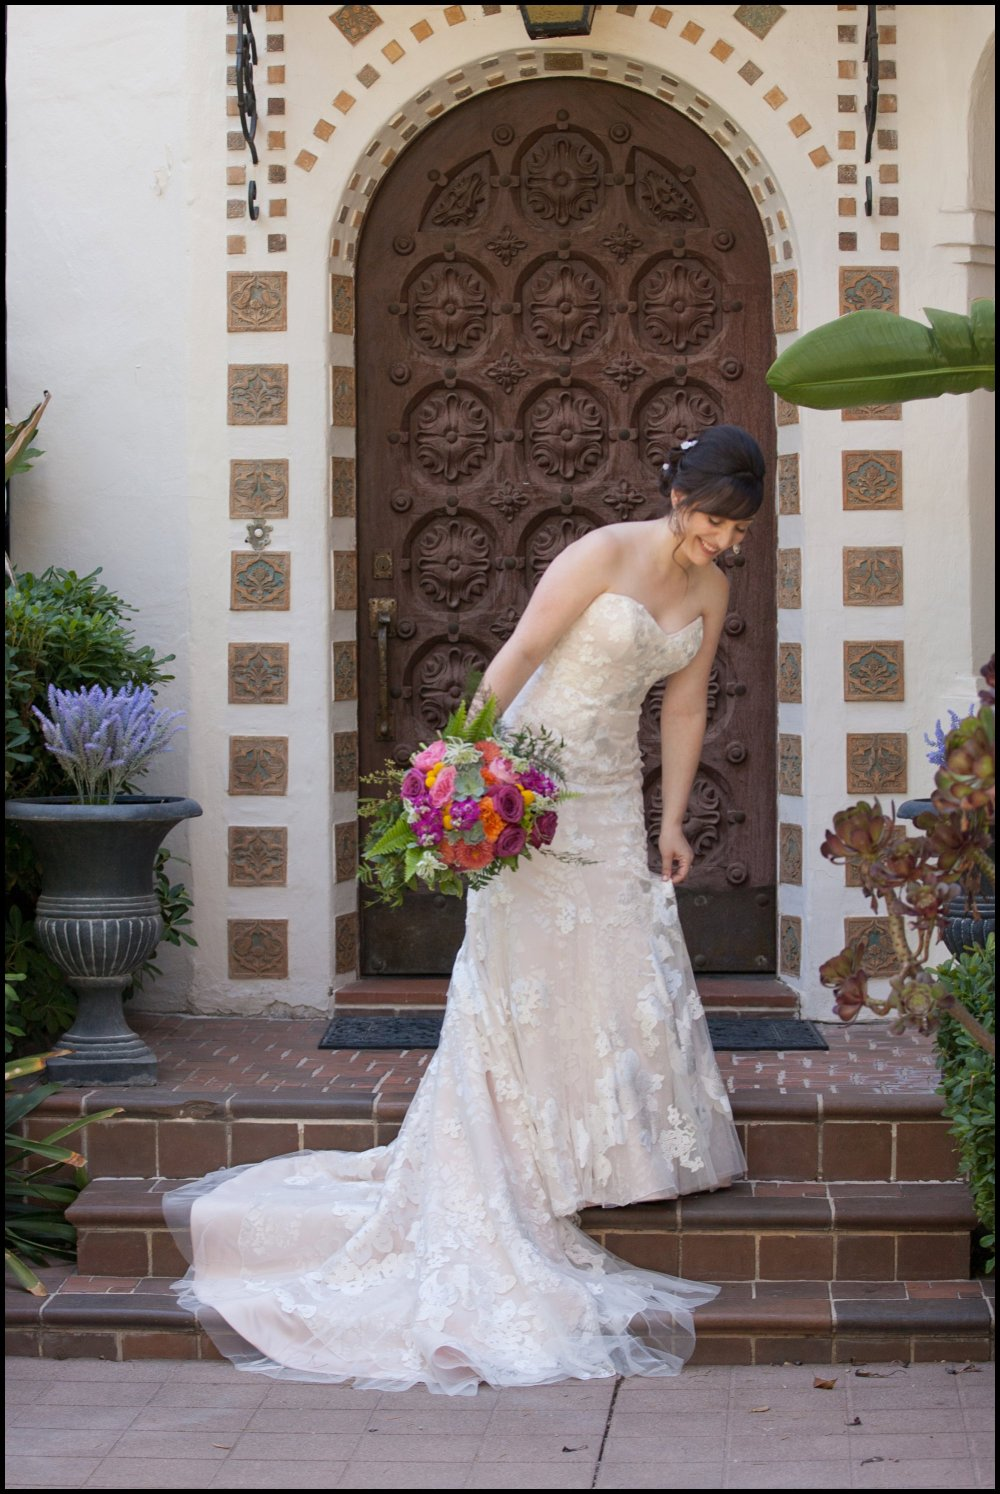 cassia_karin_lux_aeterna_photography_lili_and_max_wedding_ojai_california_acacia_mansion_blog_favorites-145.jpg